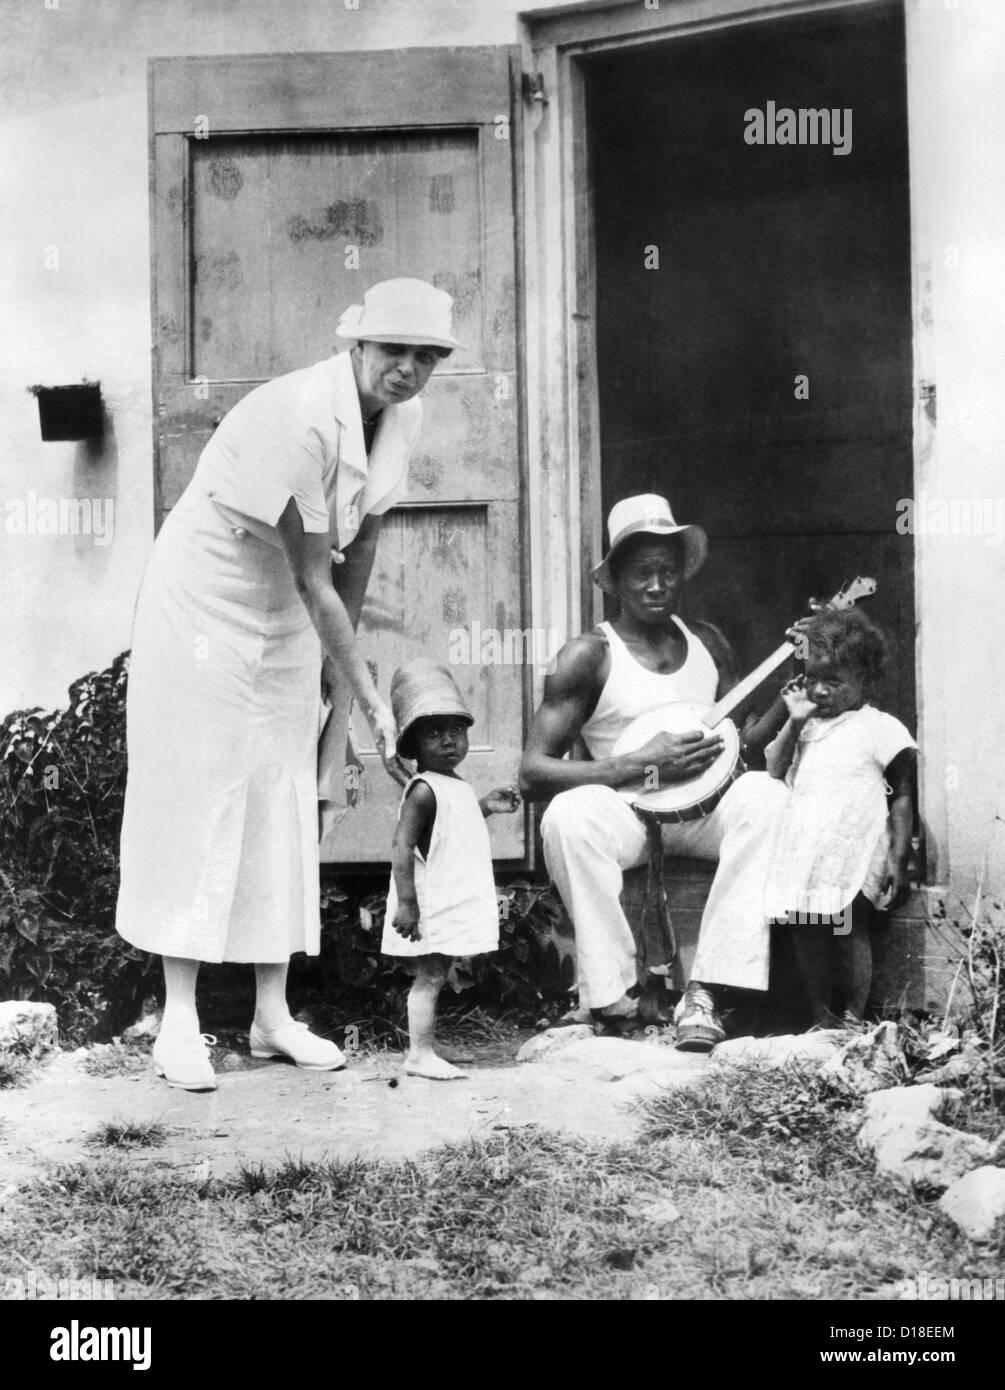 La Primera Dama Eleanor Roosevelt, conversando con la familia Winn, de Christiansted, St. Croix. Viven en obras Imagen De Stock